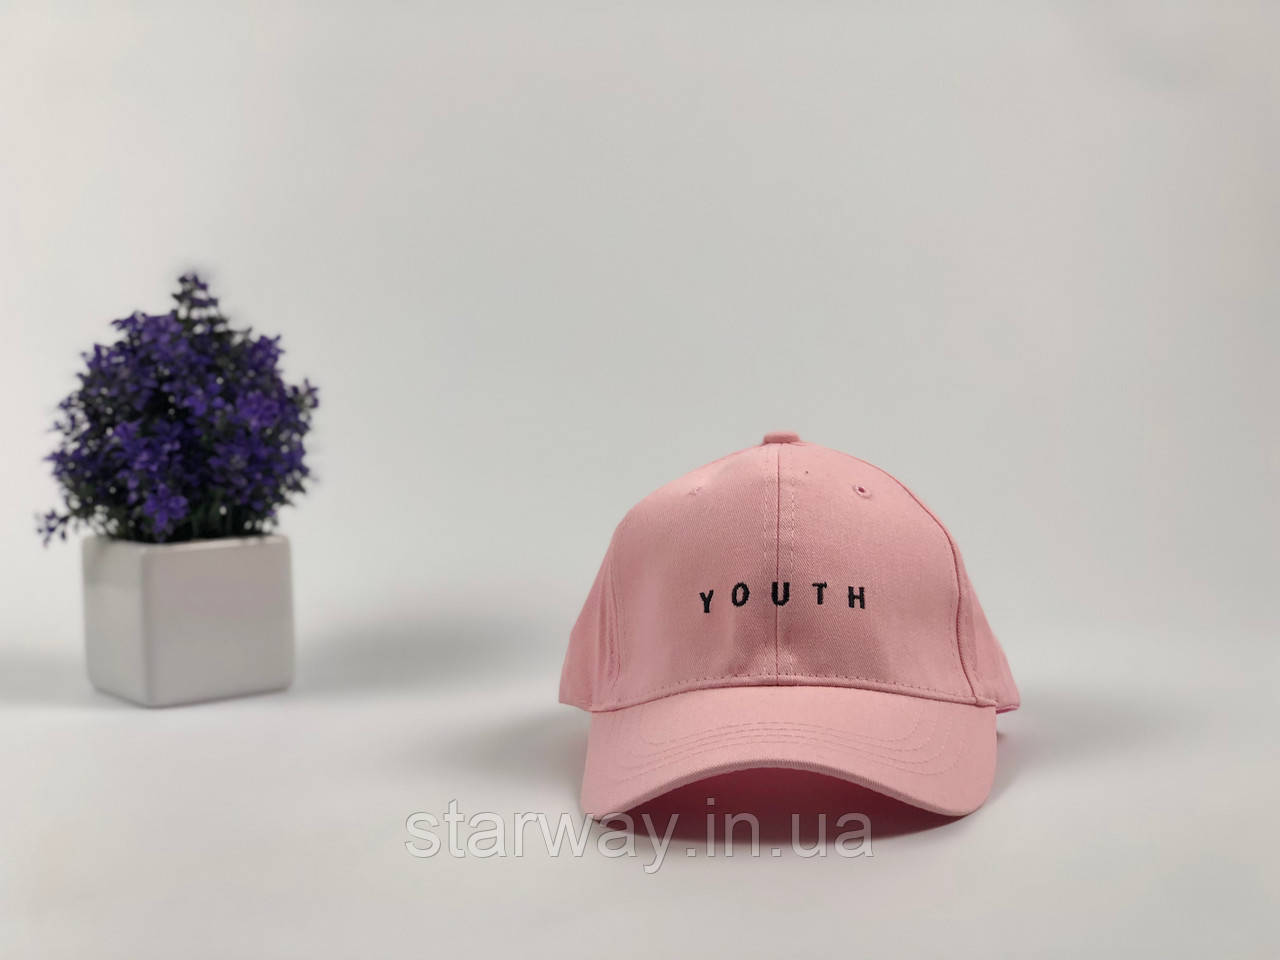 Кепка розовая Youth логотип вышивка